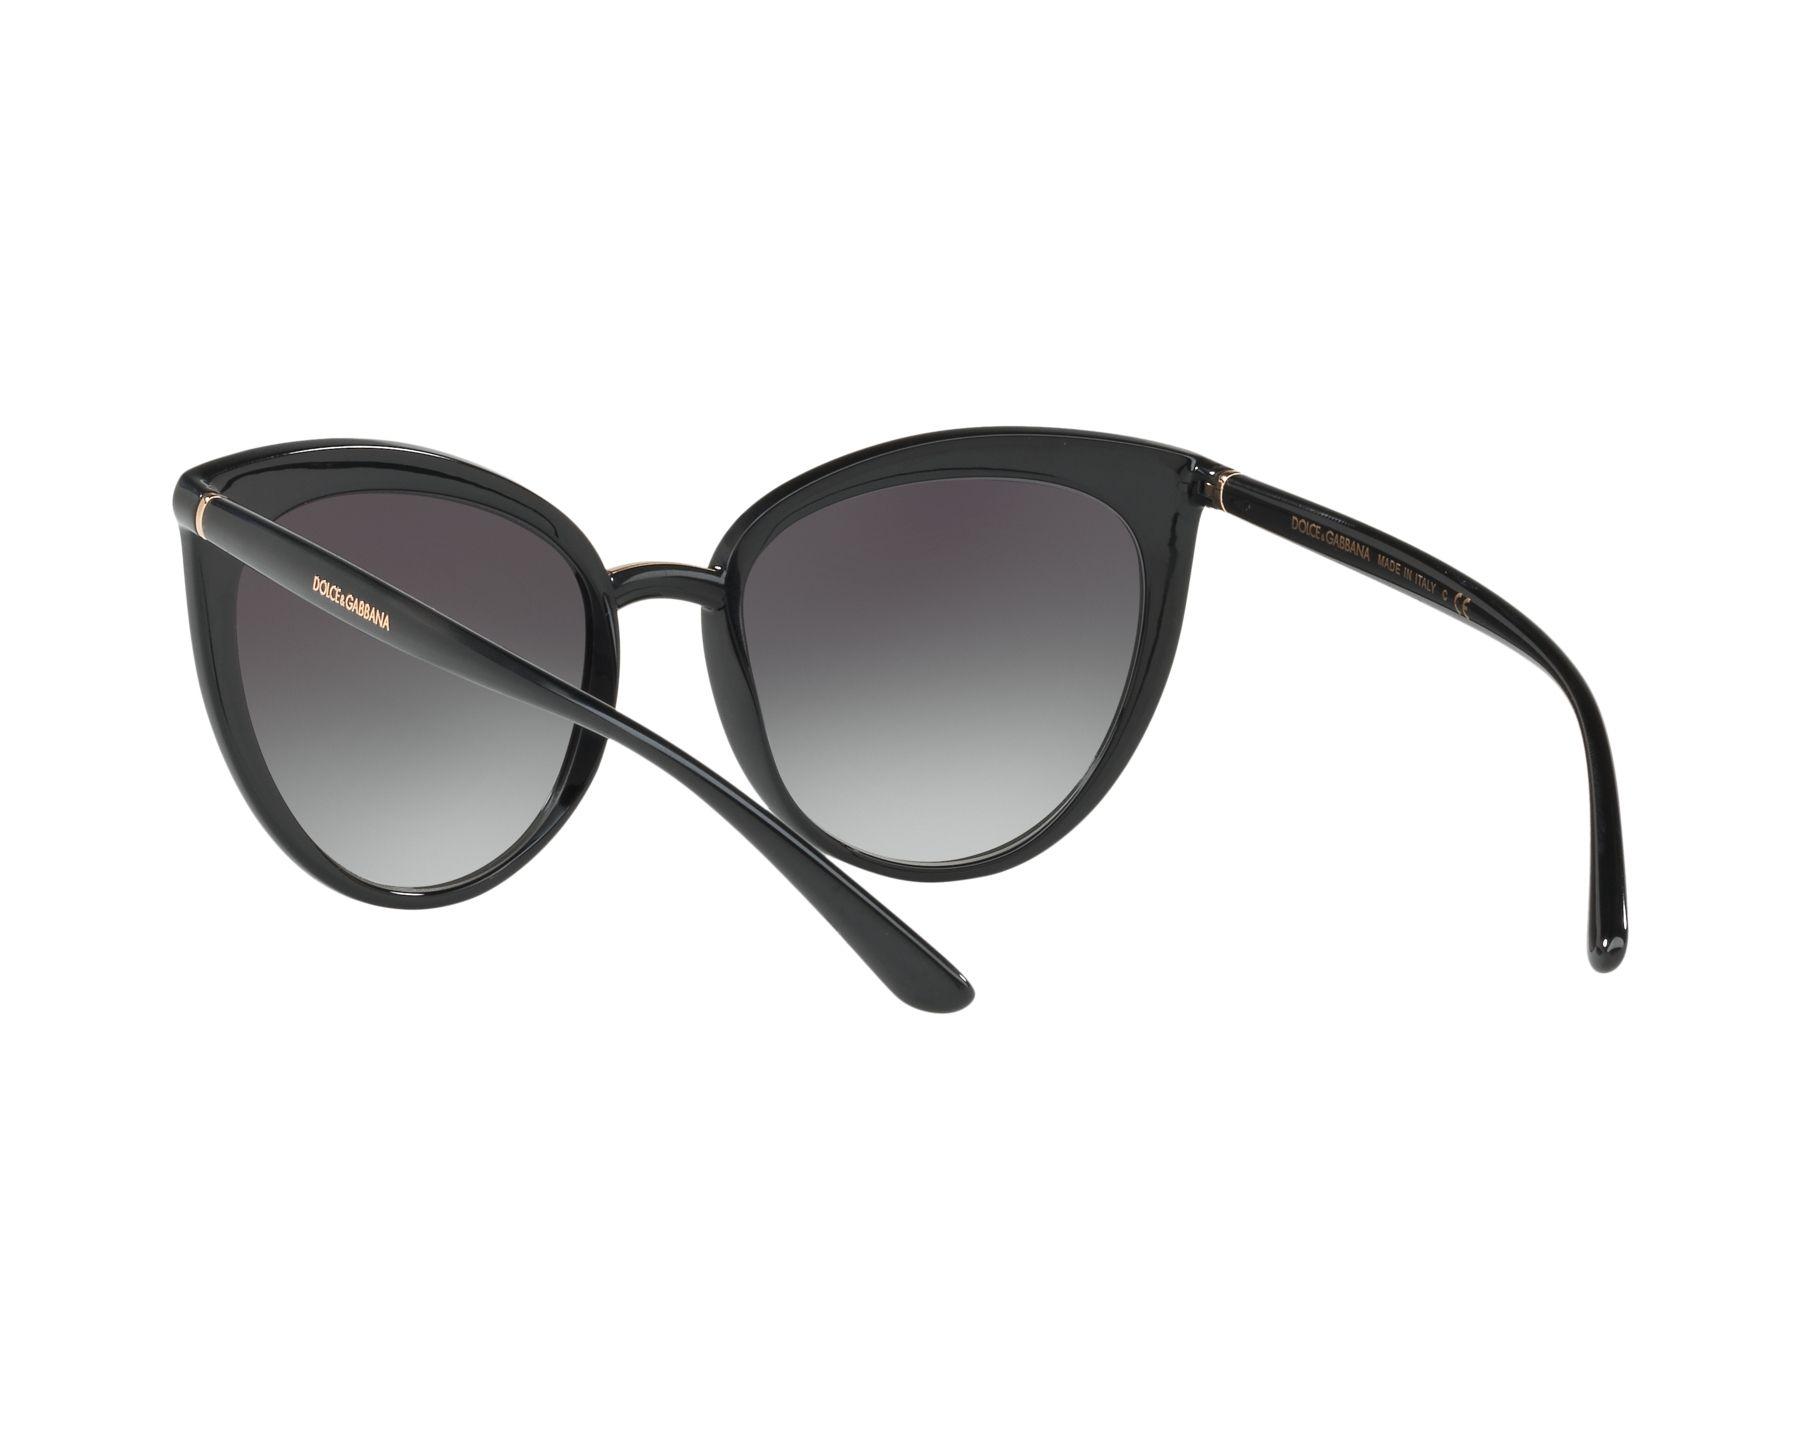 Dolce & Gabbana DG6113 501/8G 55-18 qWS5X